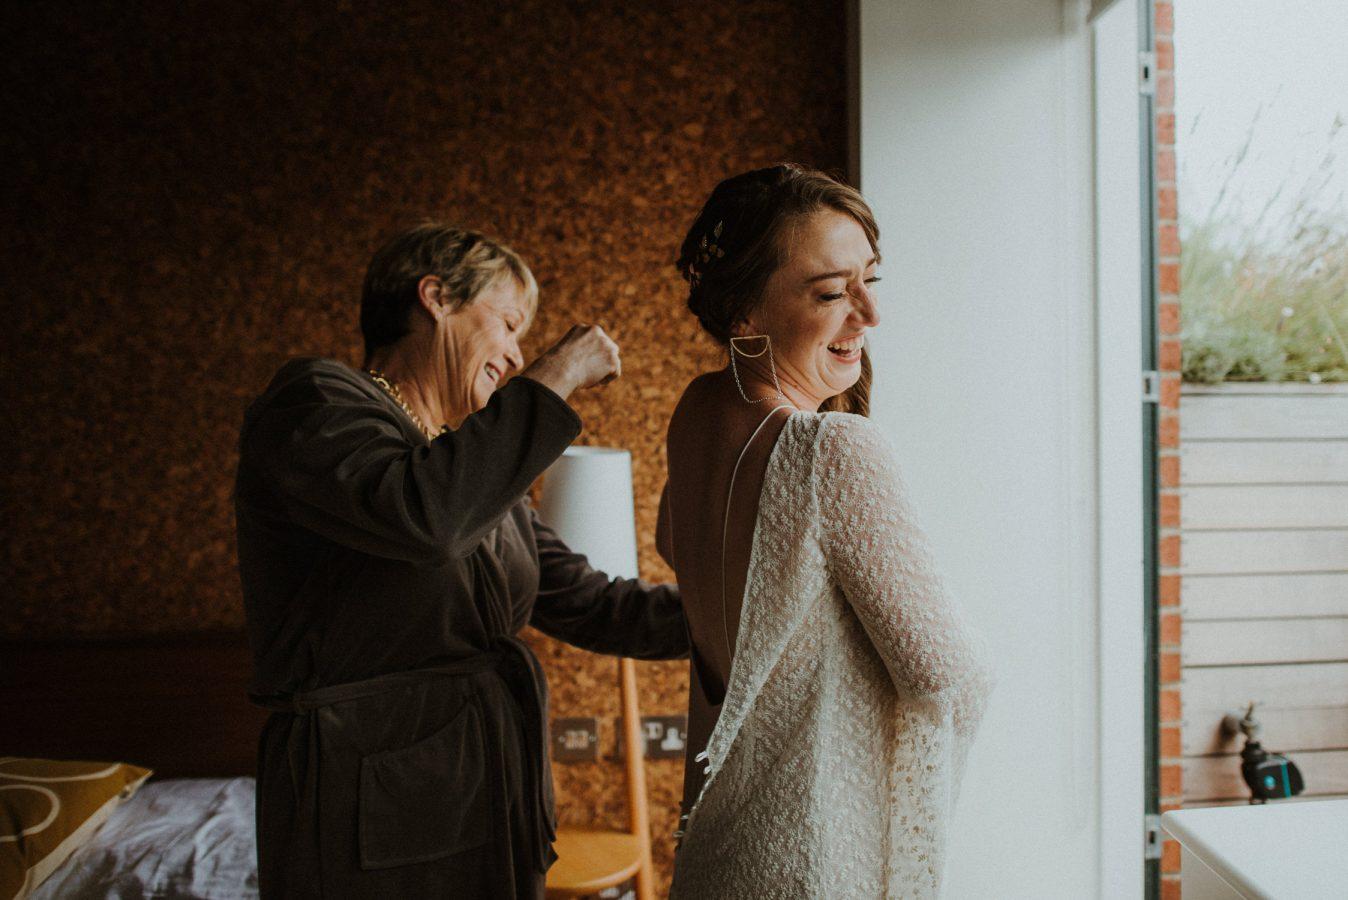 brighton-london-wedding-creative-fineart-wedding-photographer